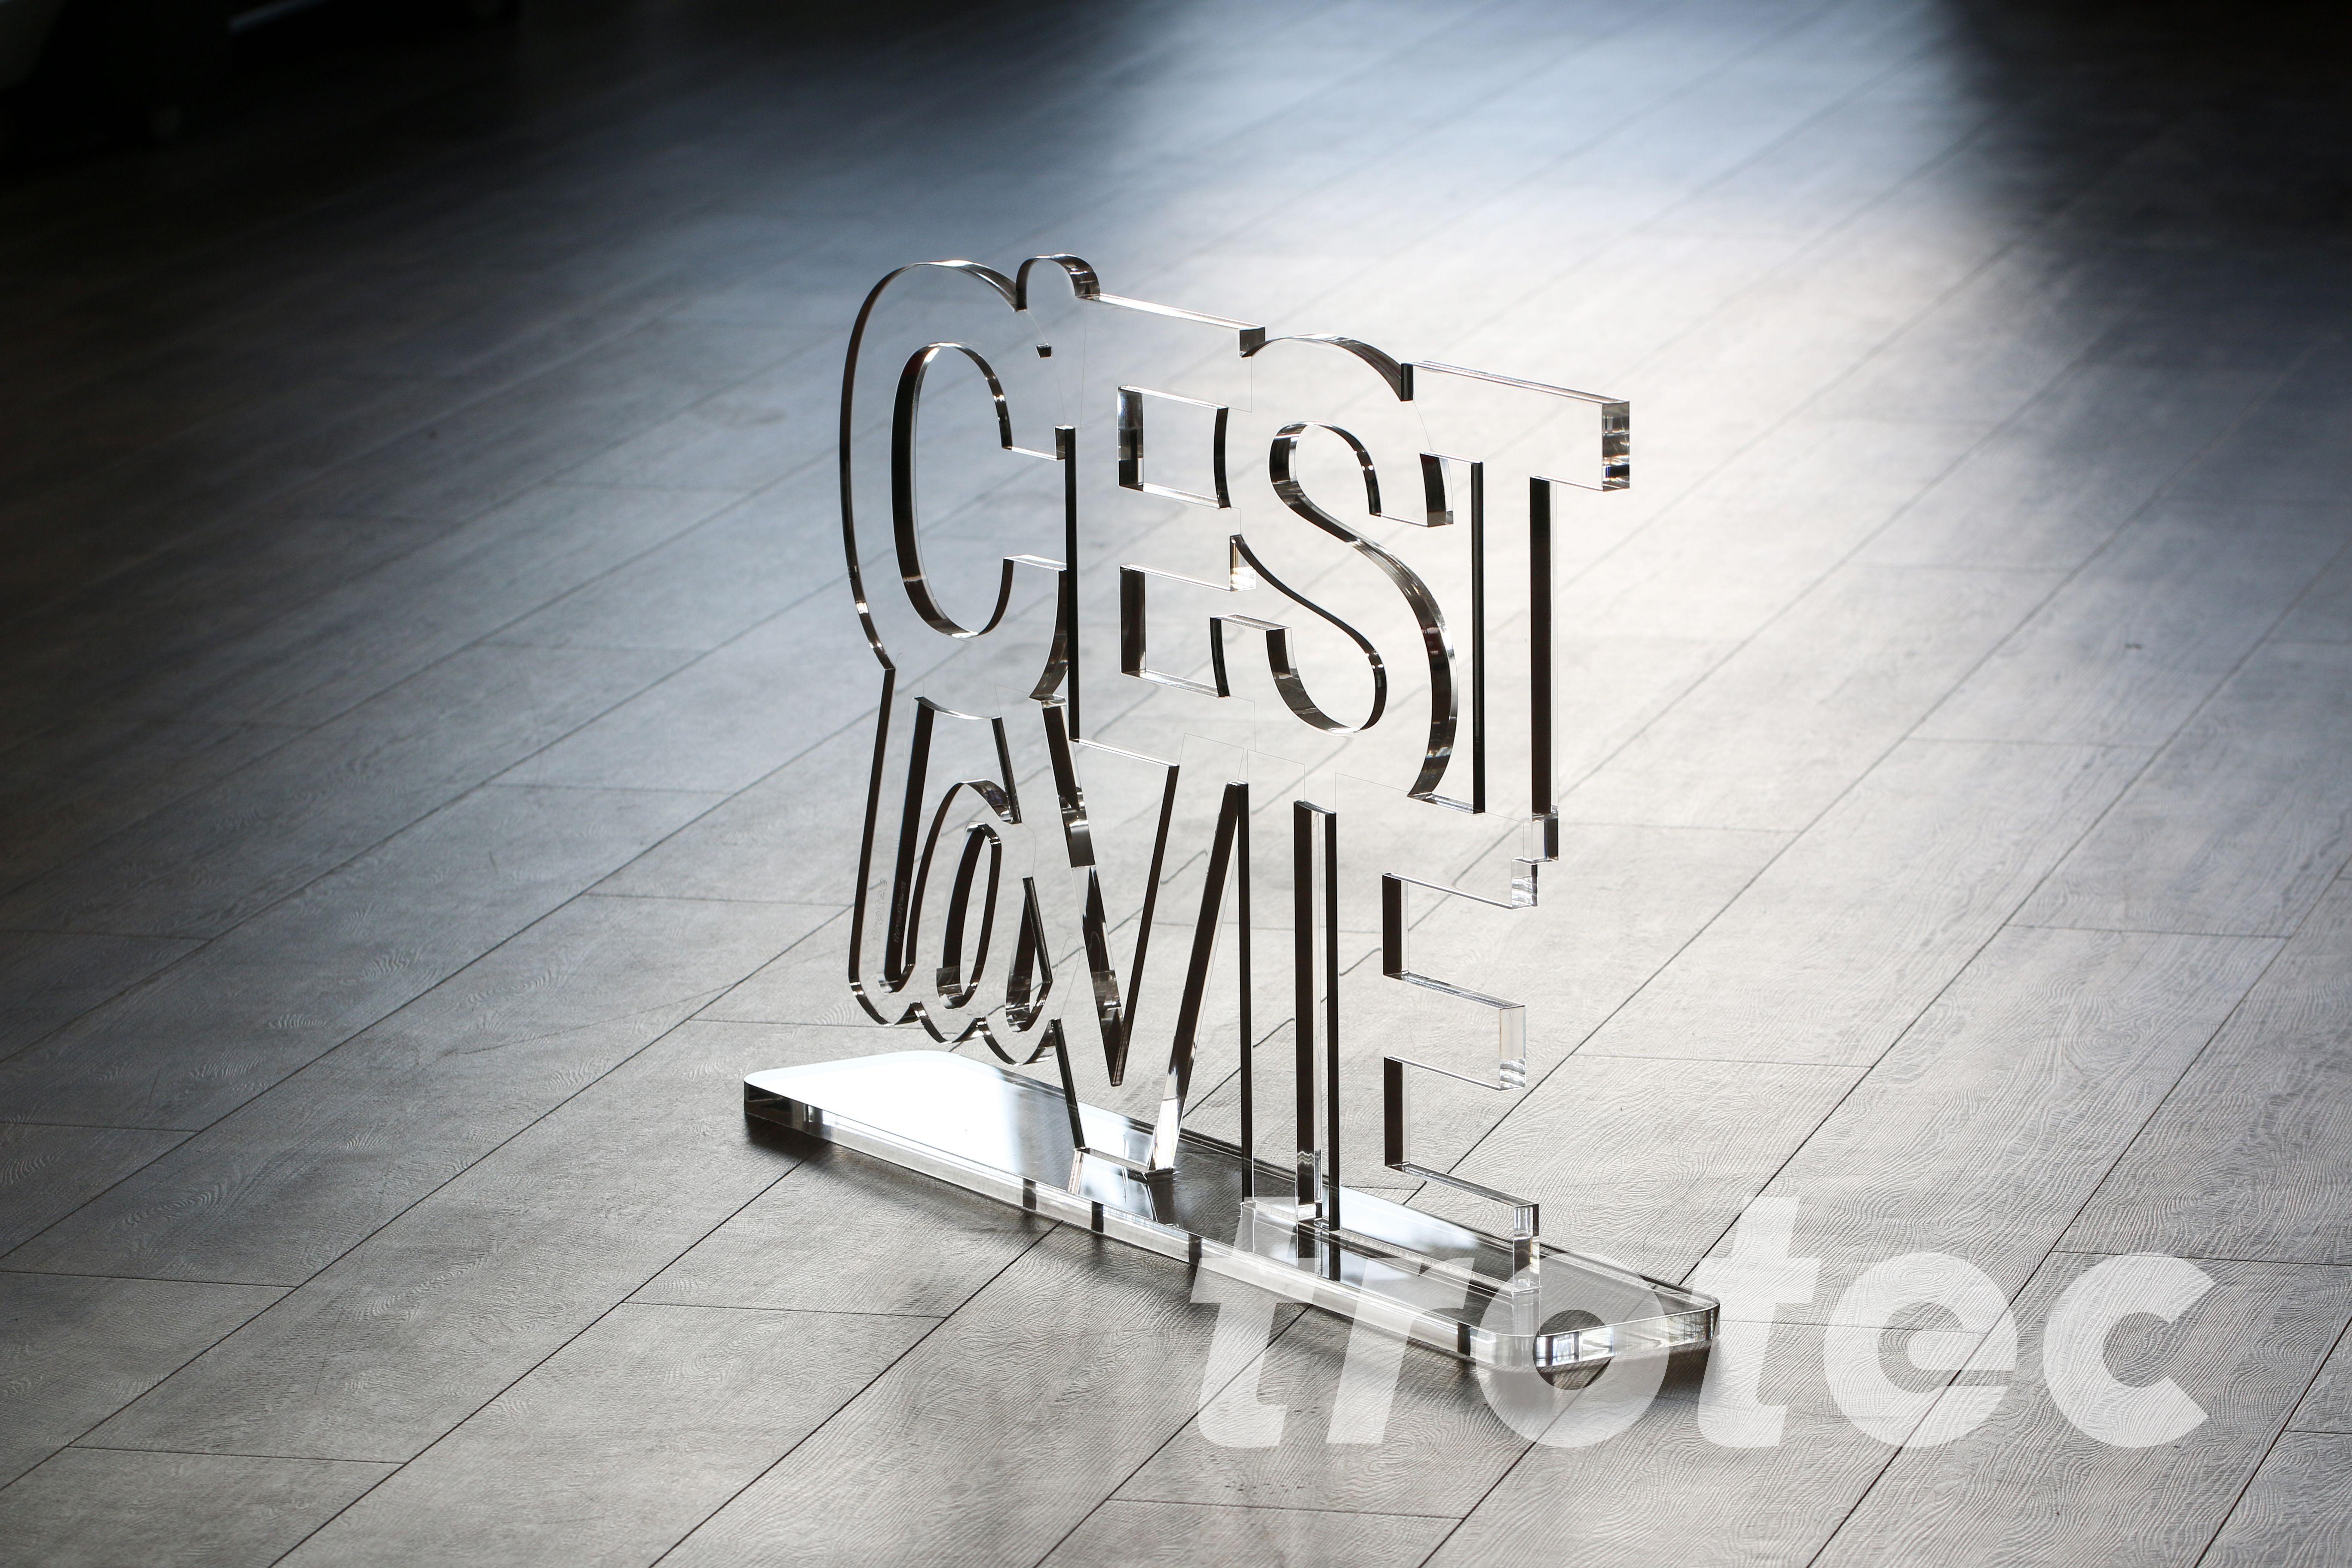 Acrylglas C Est La Vie Lebensmotto Spruch Acrylglas Acryl Gravur Maschine